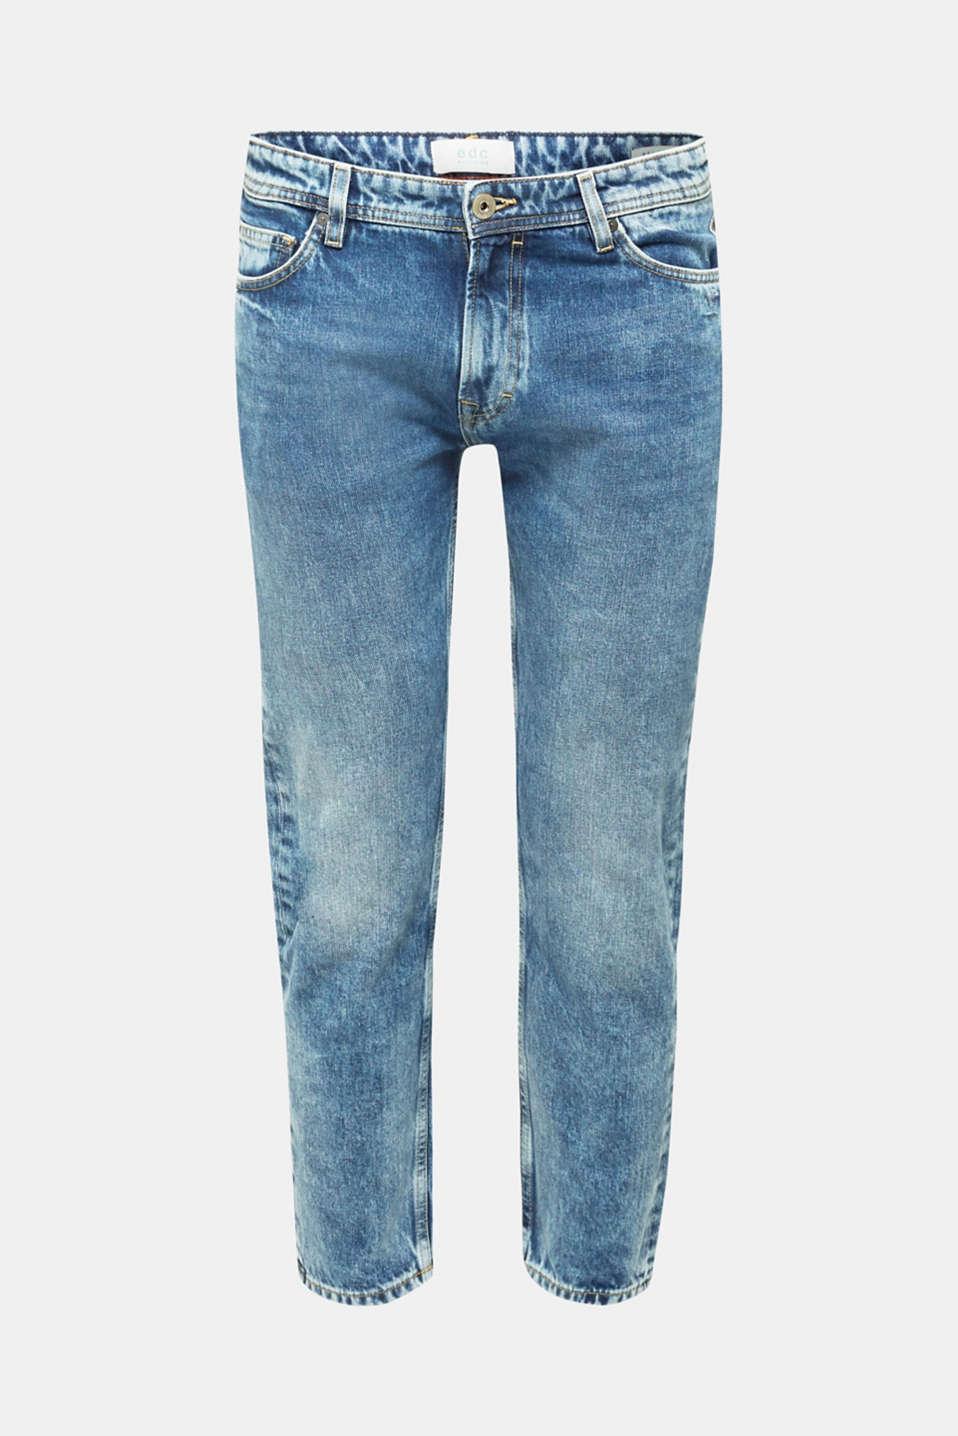 Jeans in 100% cotton, BLUE LIGHT WASH, detail image number 4